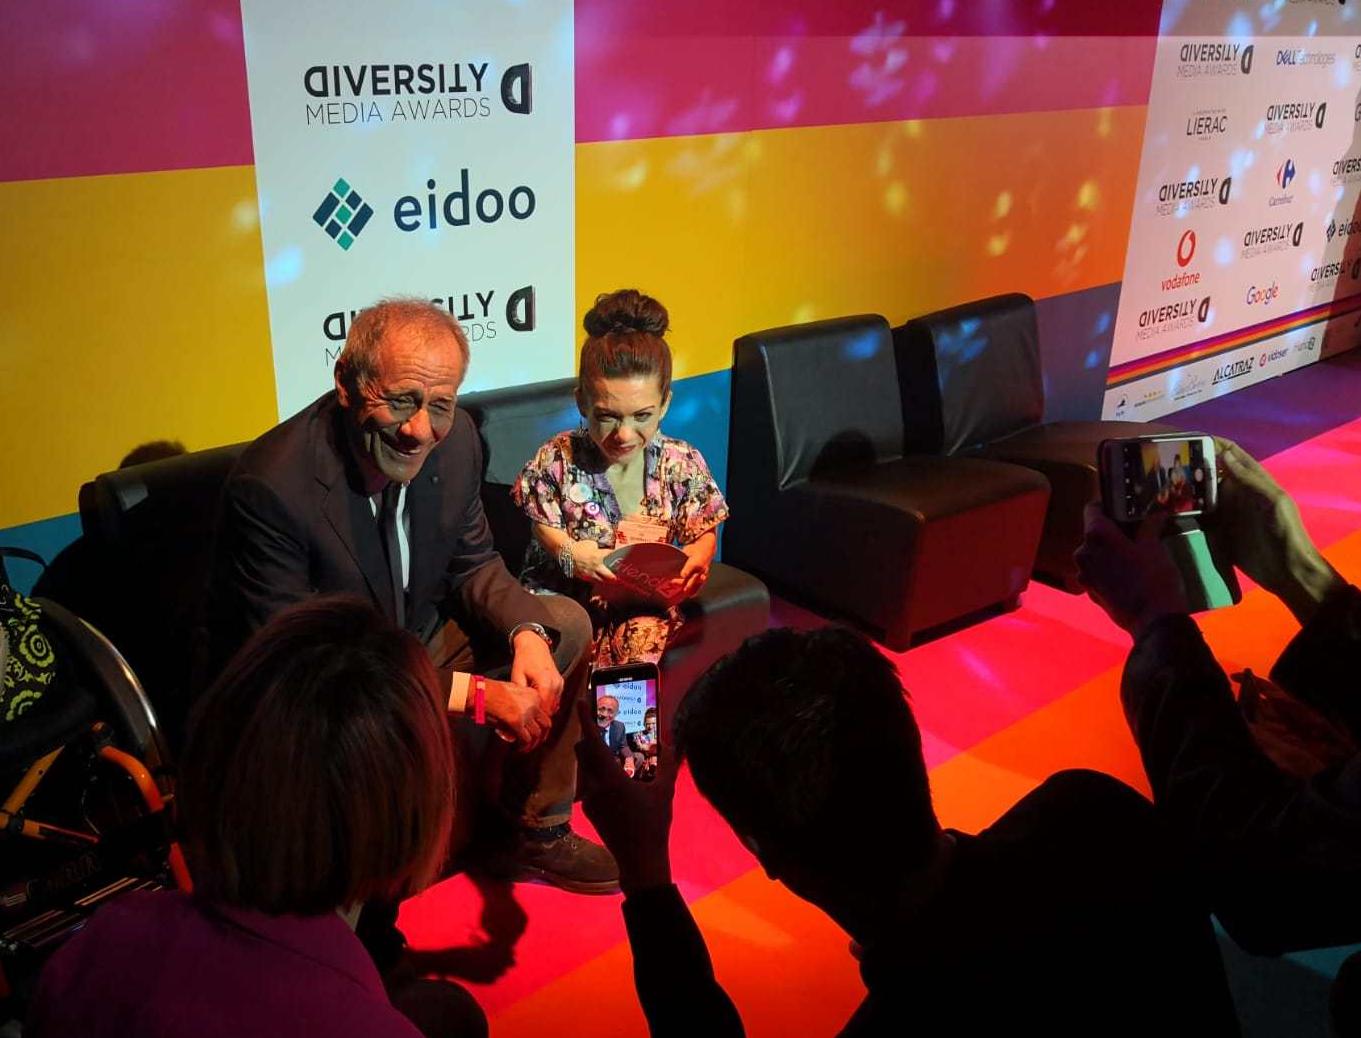 Diversity Media Awards: Nanabianca intervista Roberto Vecchioni